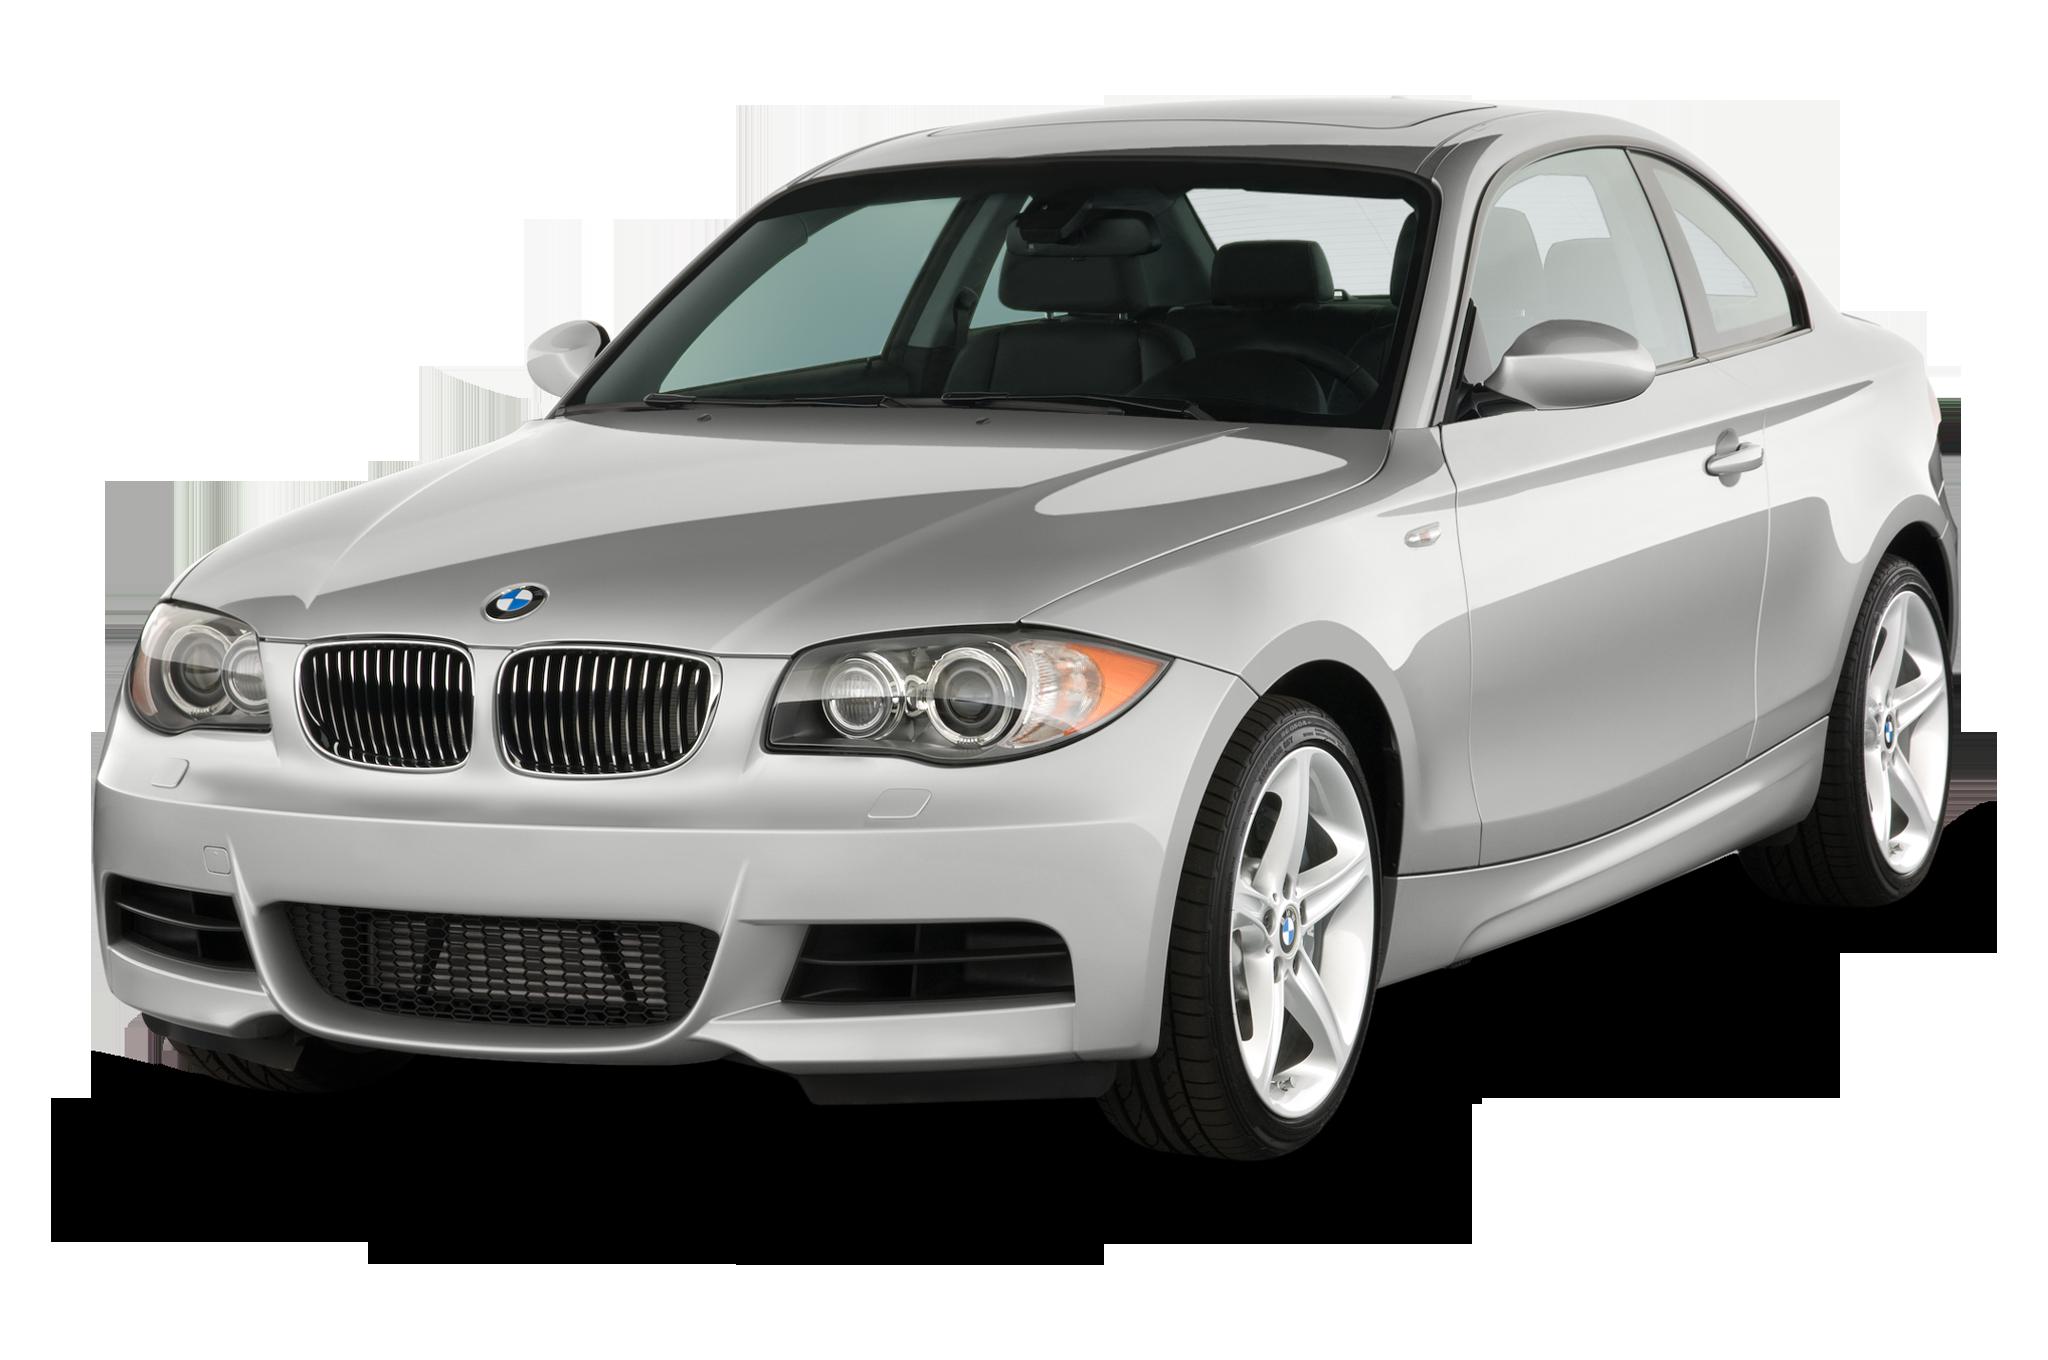 2010 BMW 135i Coupe - Editor\'s Notebook - Automobile Magazine